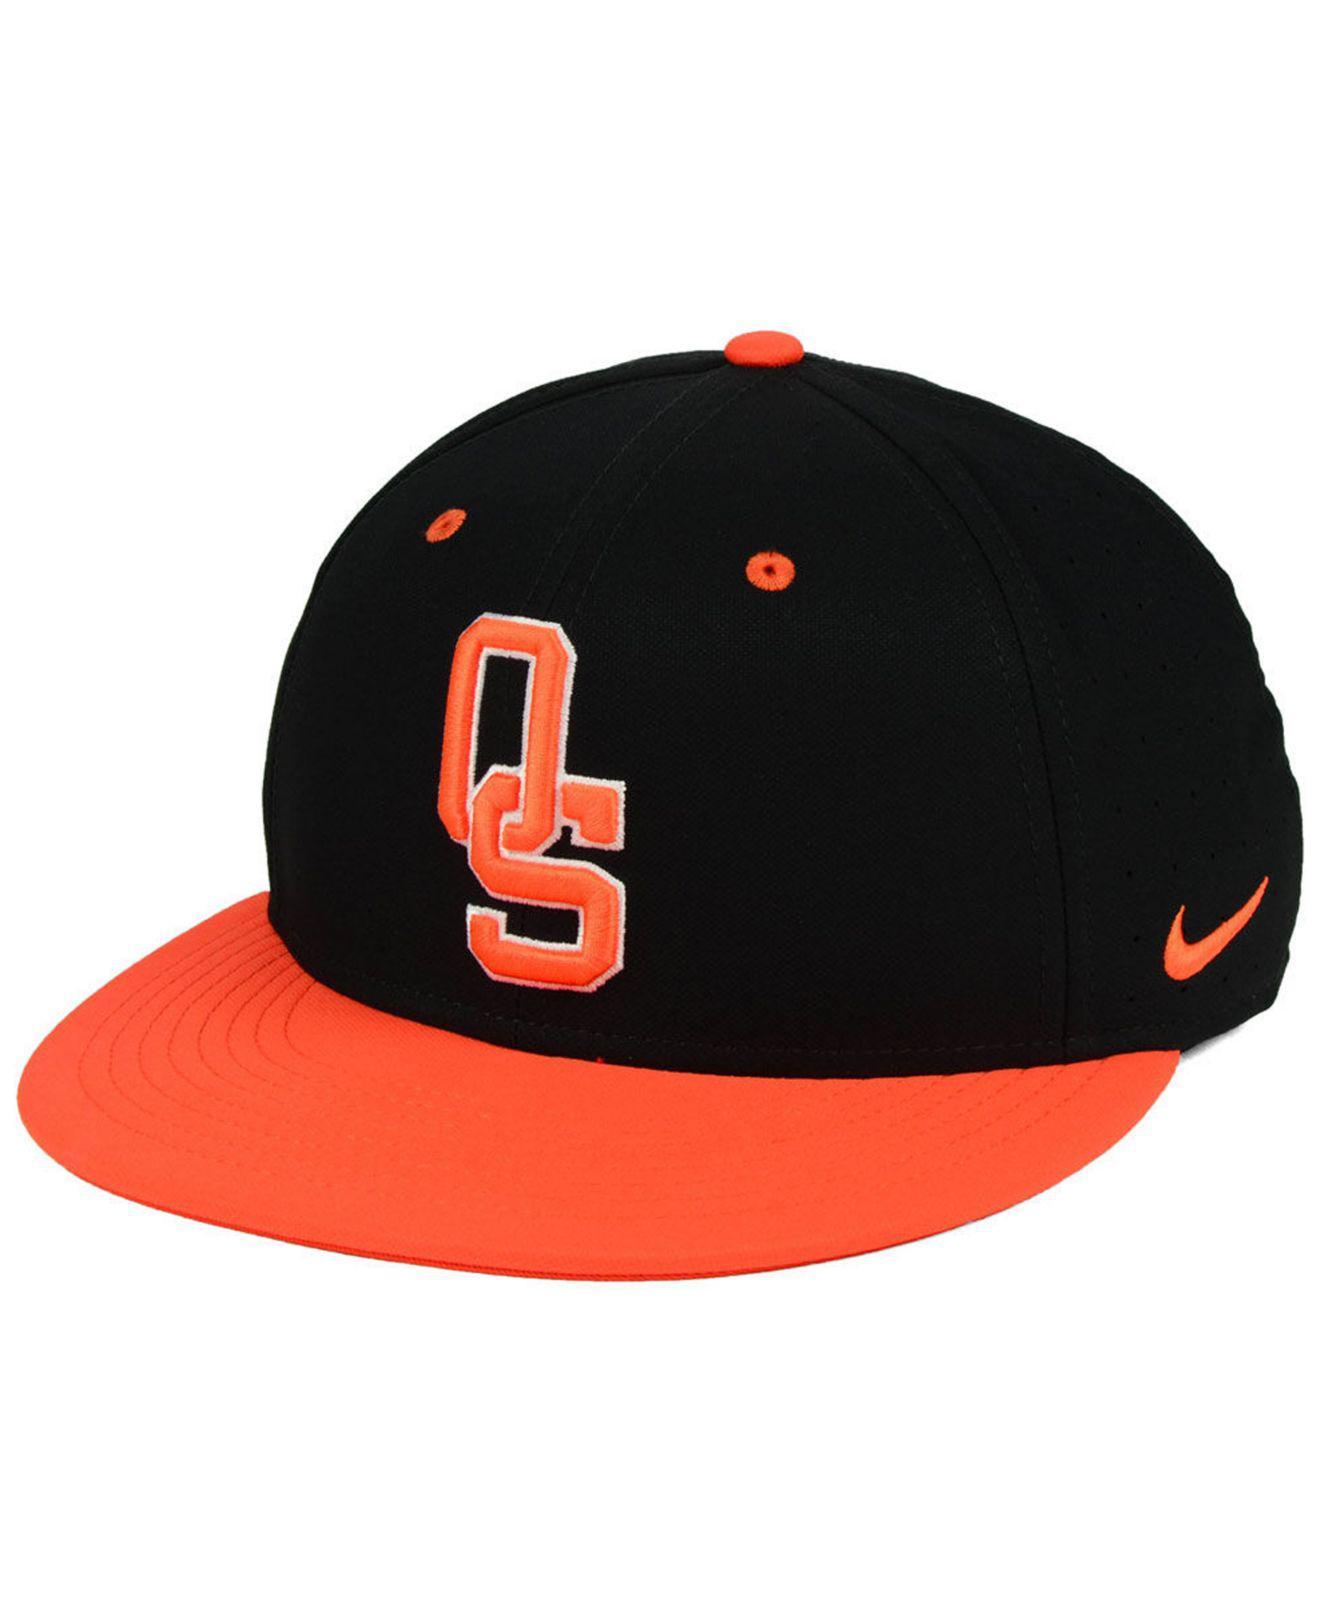 59b57f08289 Nike. Men s Black Oklahoma State Cowboys Aerobill True Fitted Baseball Cap